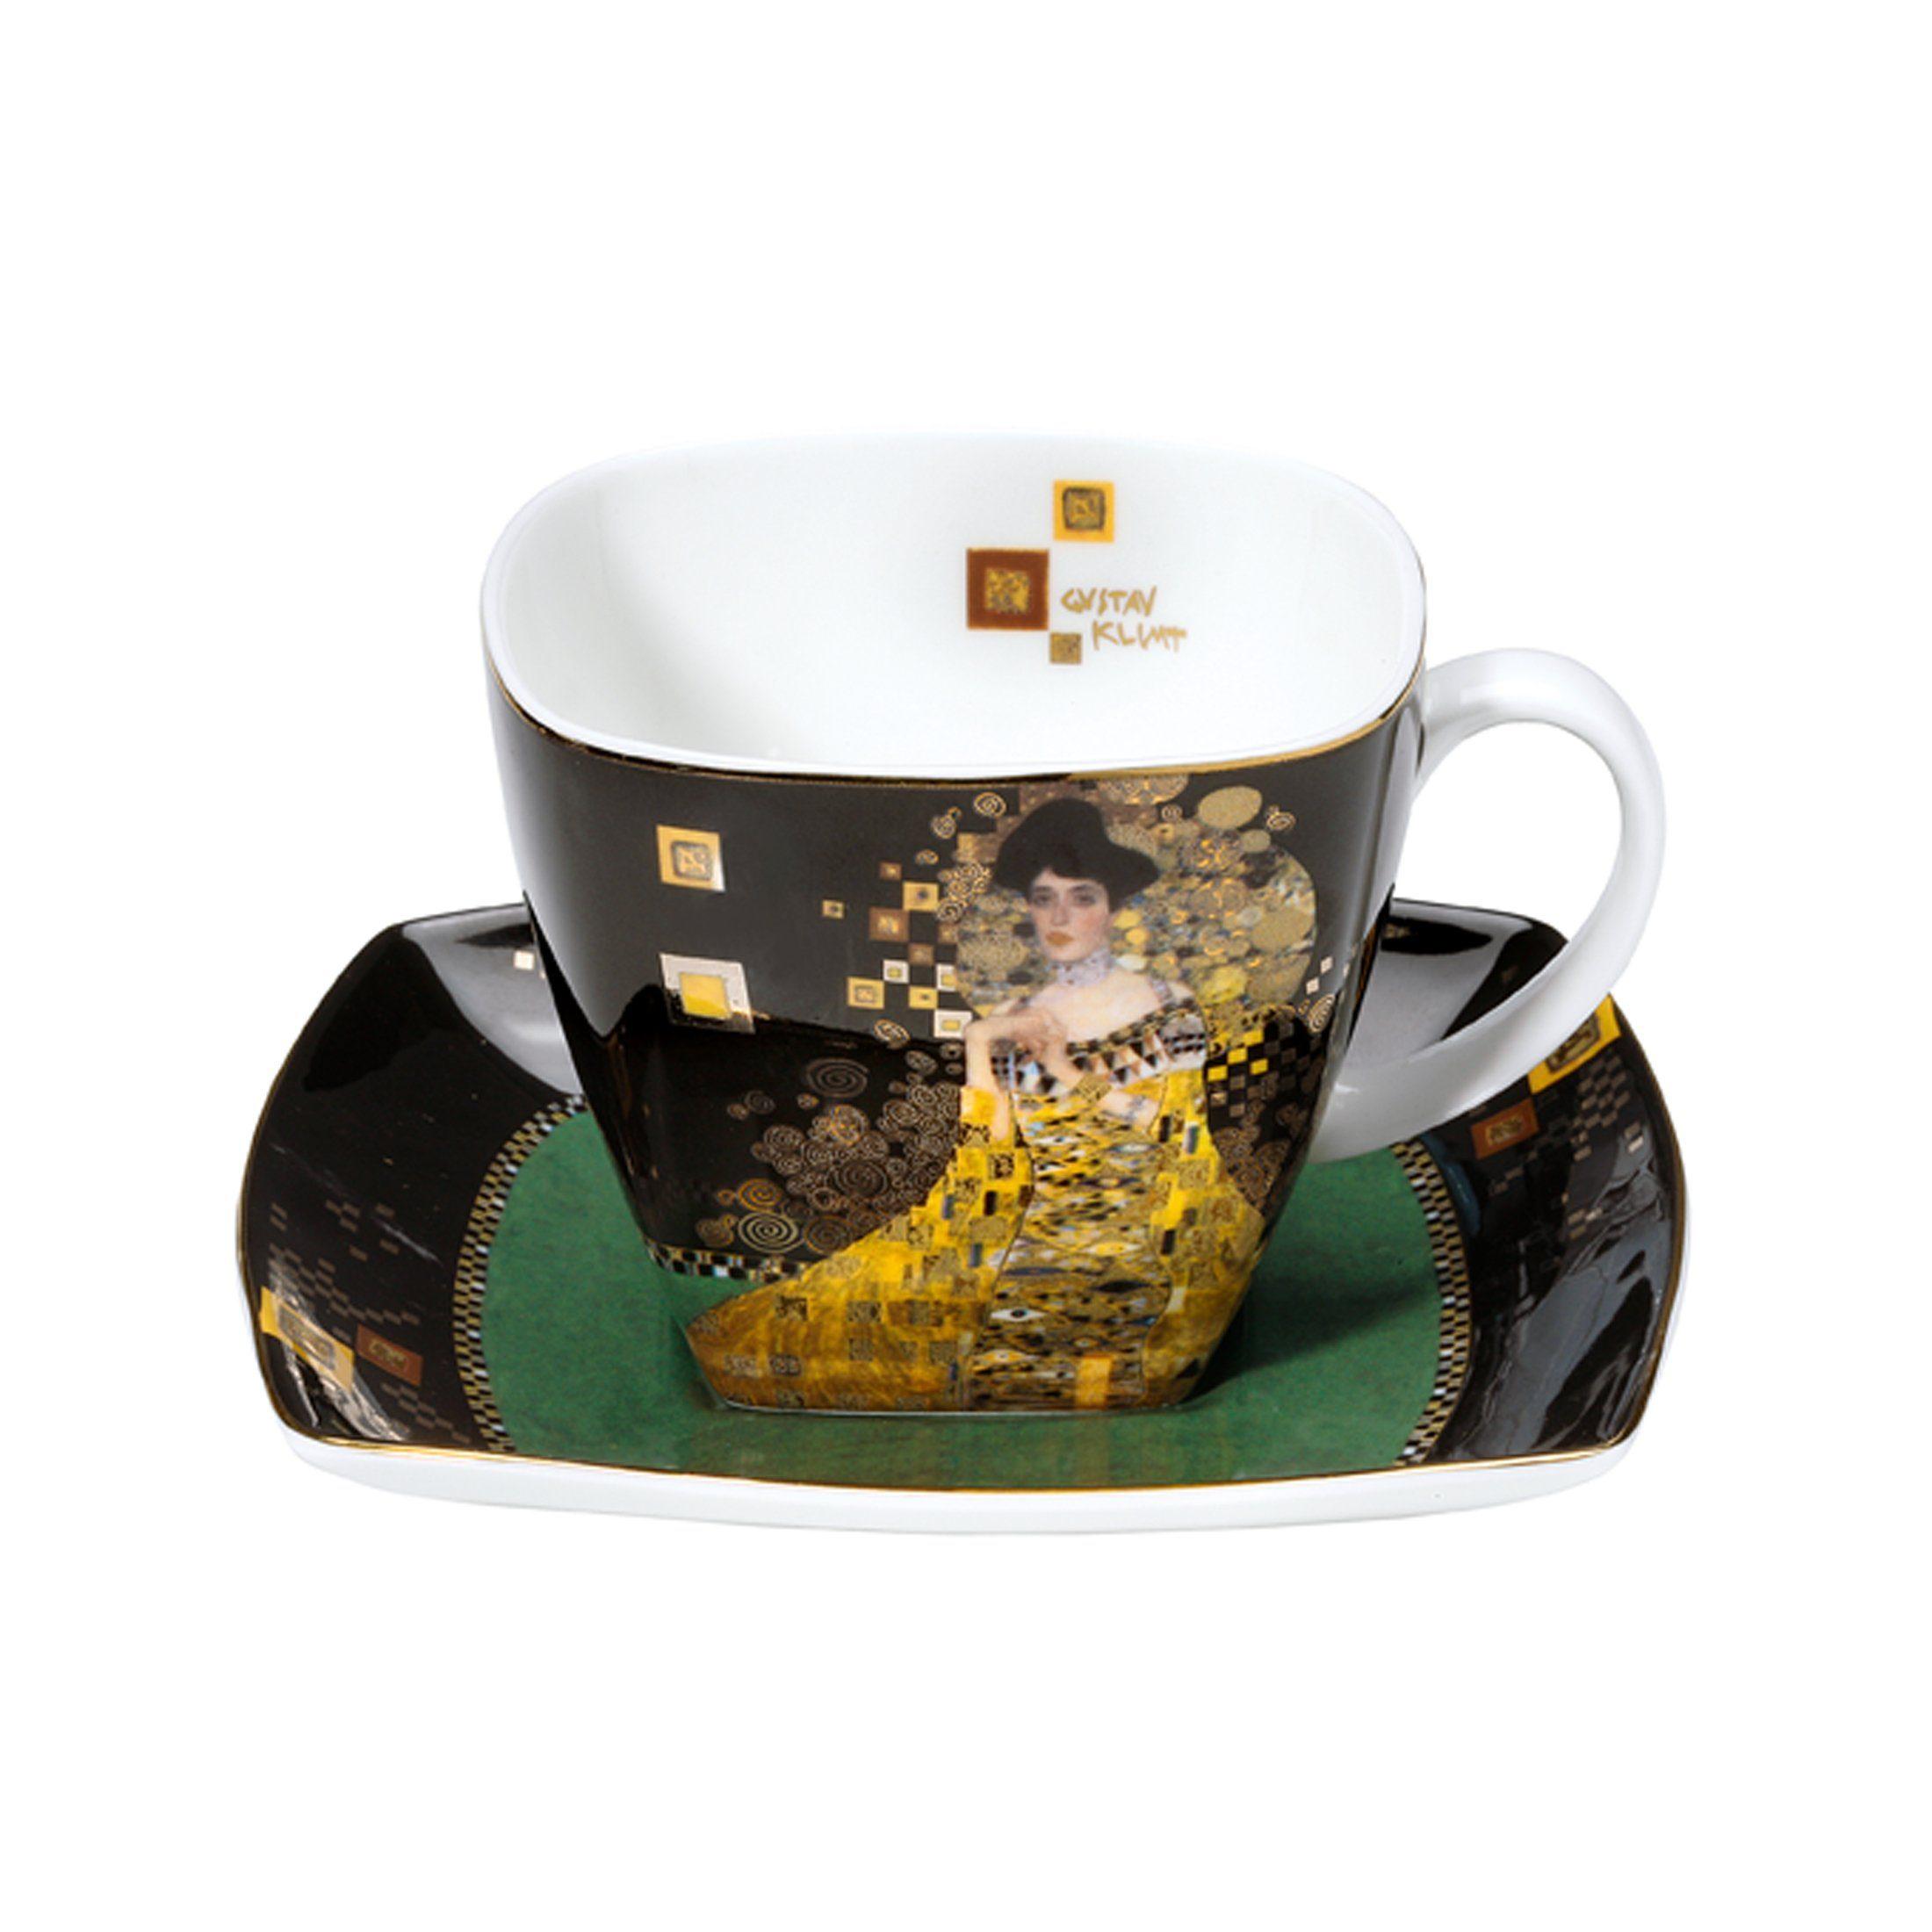 Goebel Adele Bloch-Bauer - Kaffeetasse »Artis Orbis«